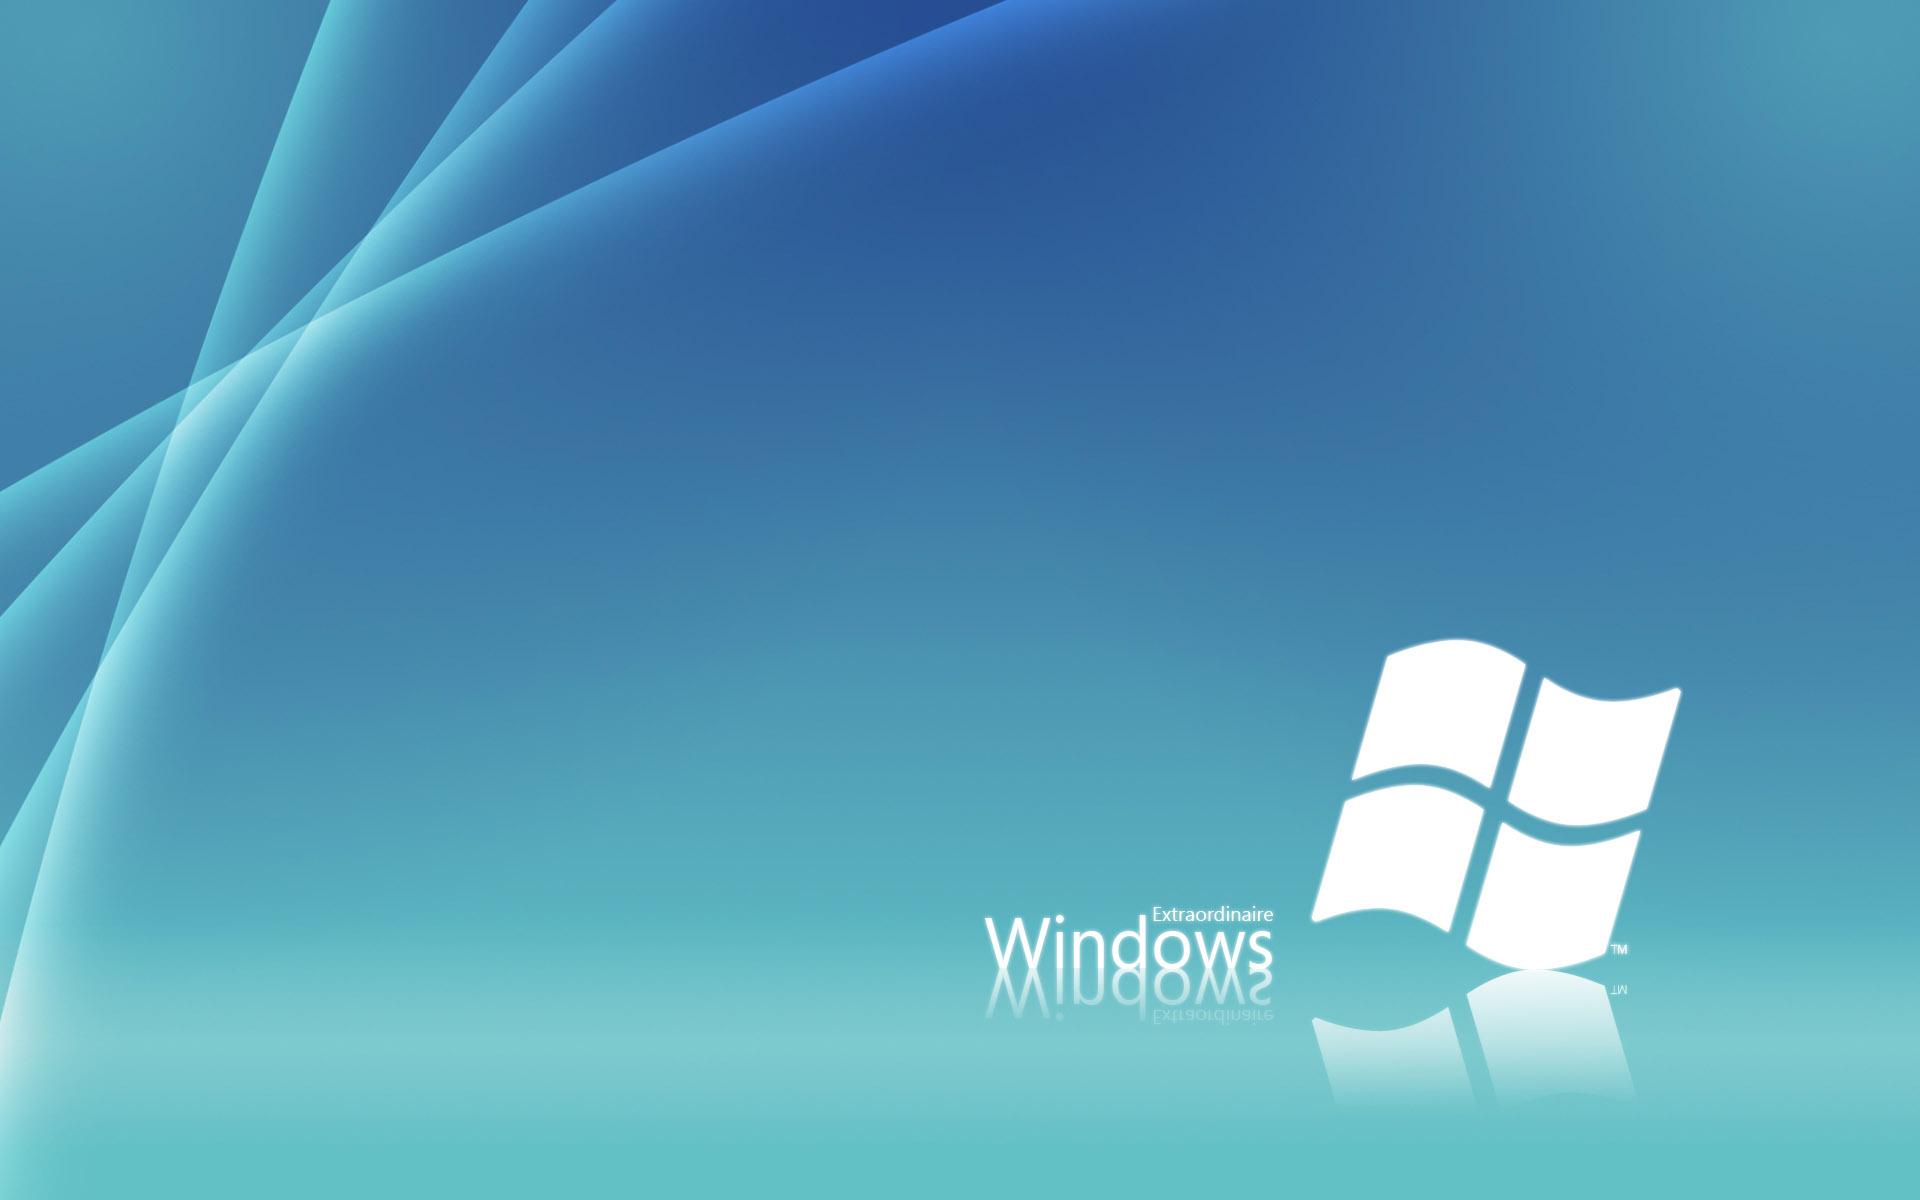 Windows7 win7 for Esteban paredes wallpaper hd